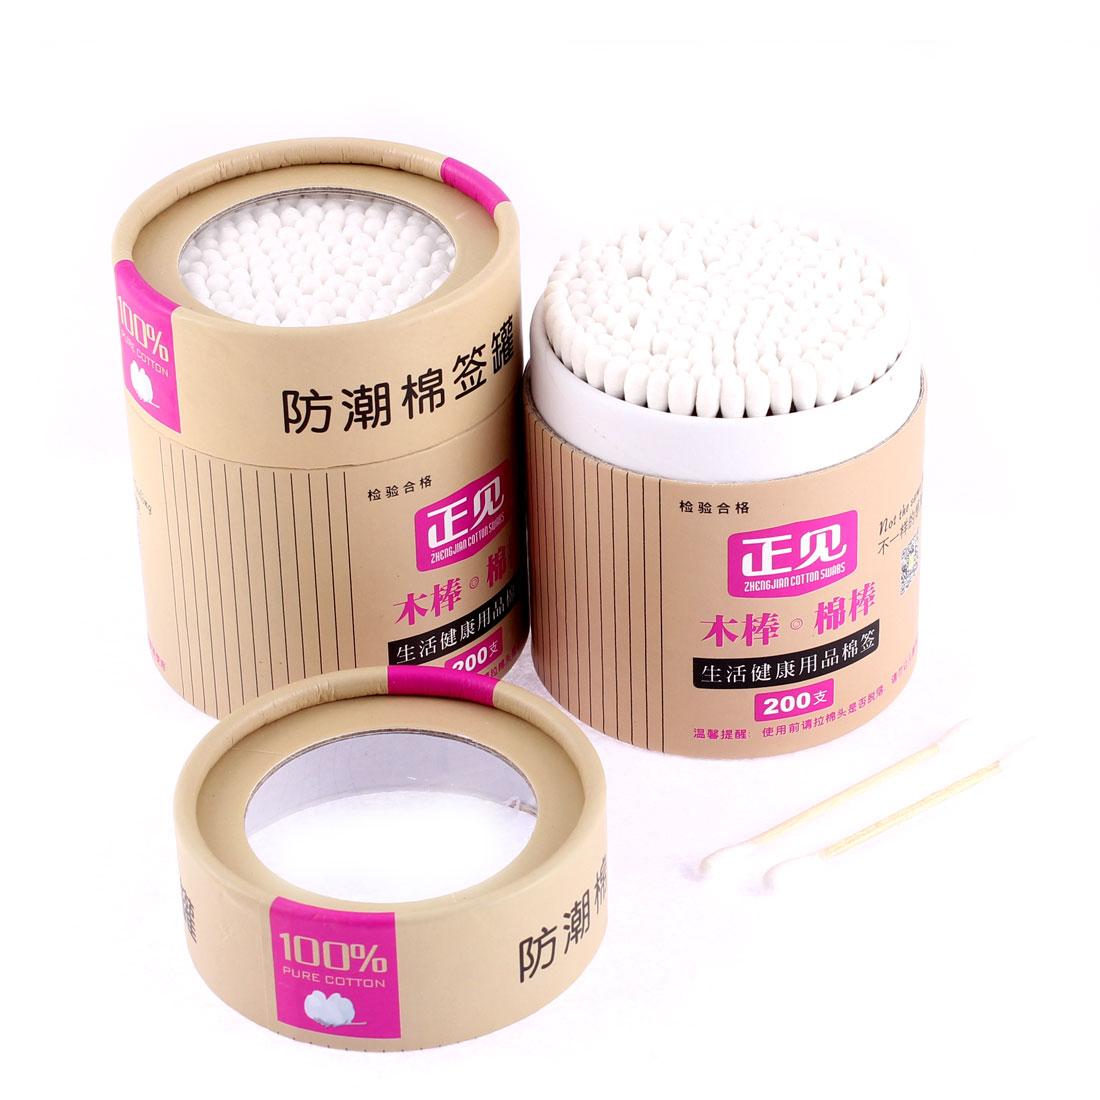 Make Up Cotton Swab Moistureproof Case Box Container Holder Storage 2pcs